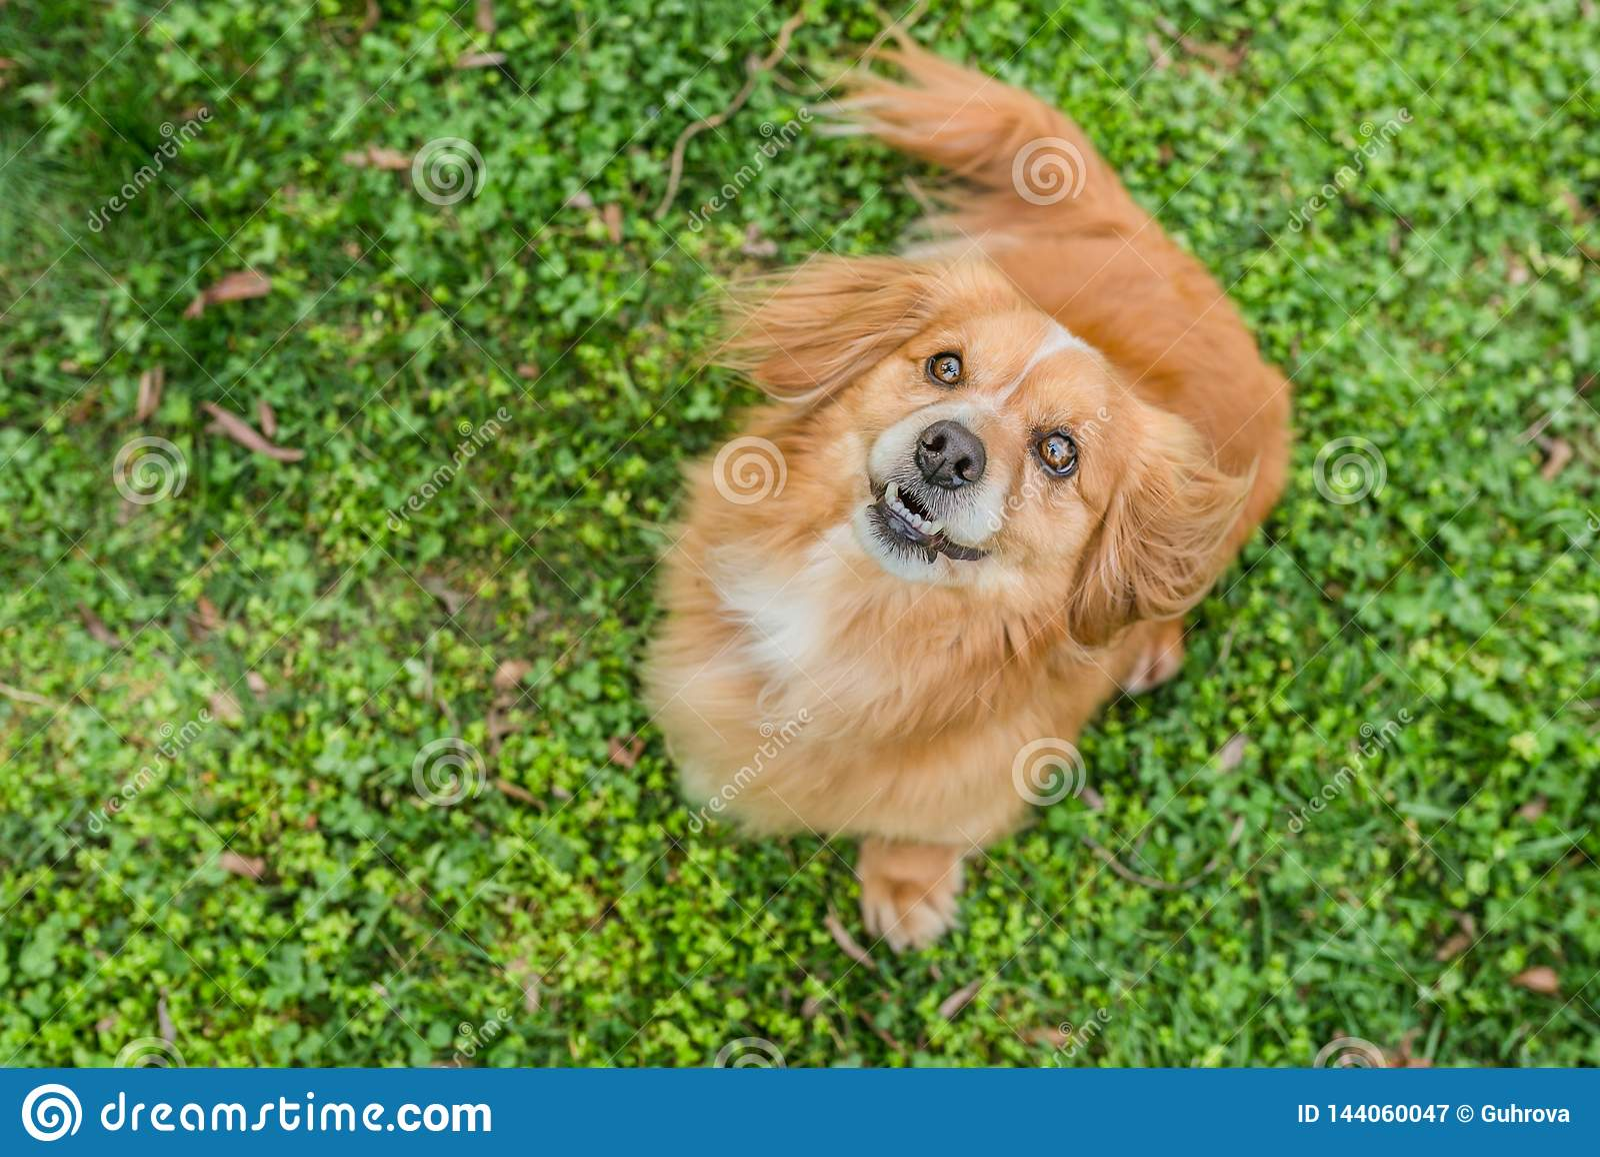 Hoogste meningsportret van leuk weinig jonge gemengde rassenhond